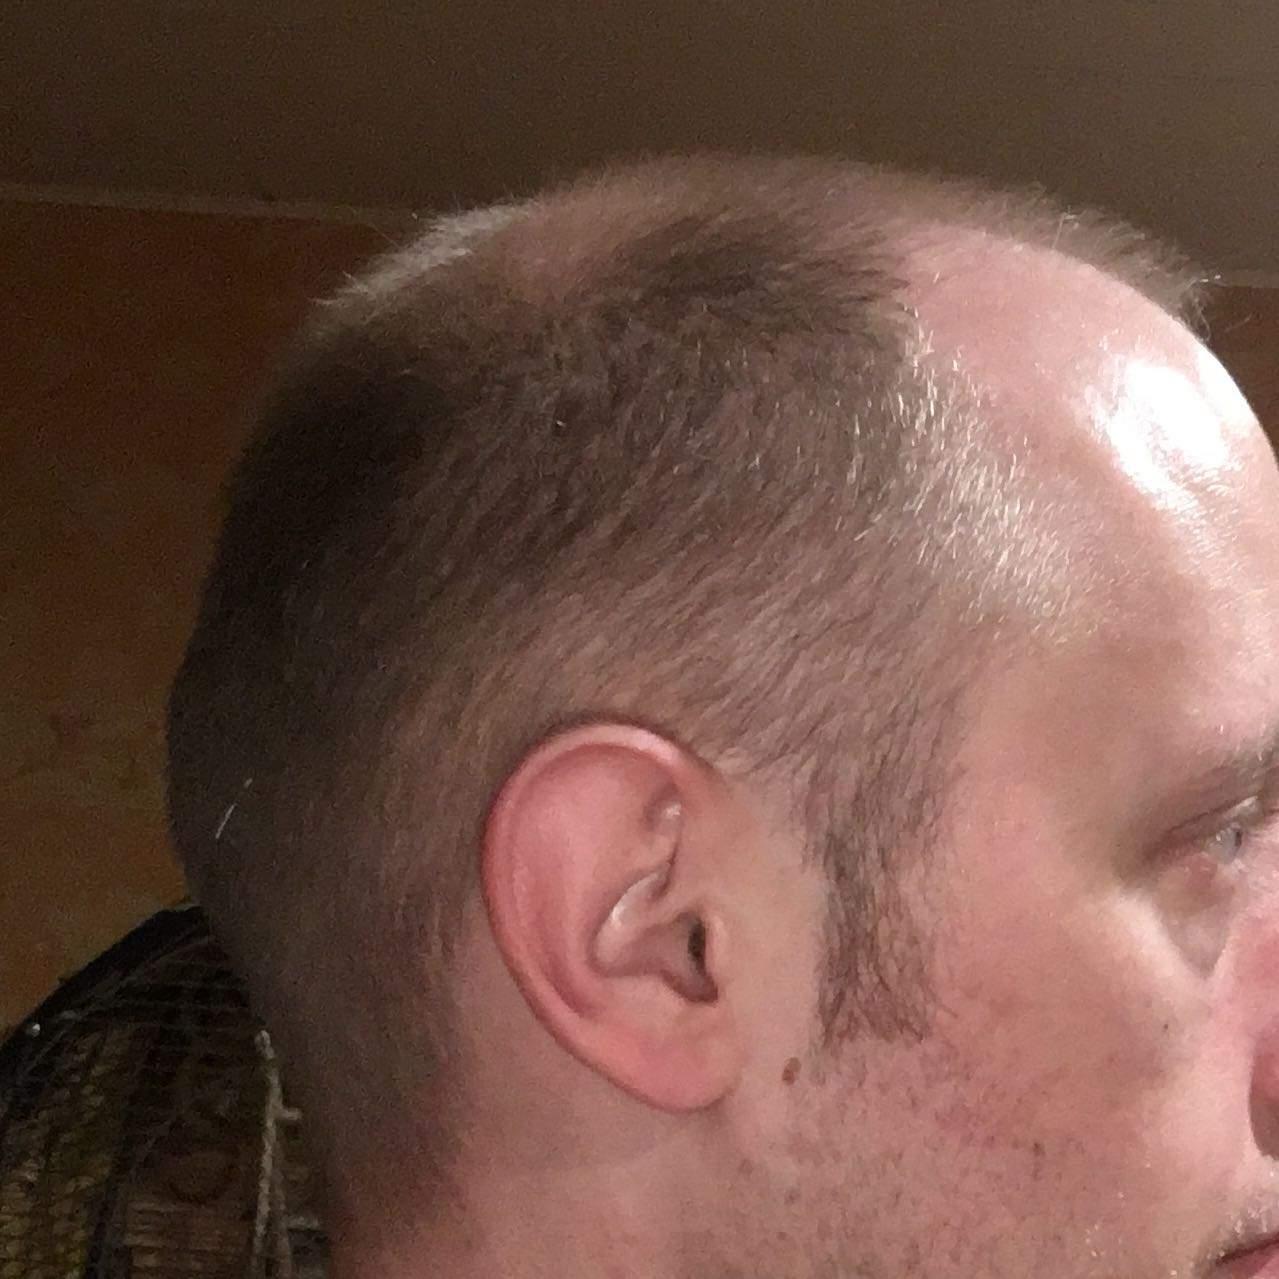 Glatze/Millimeter schnitt? (Haare, Friseur, Haarausfall)